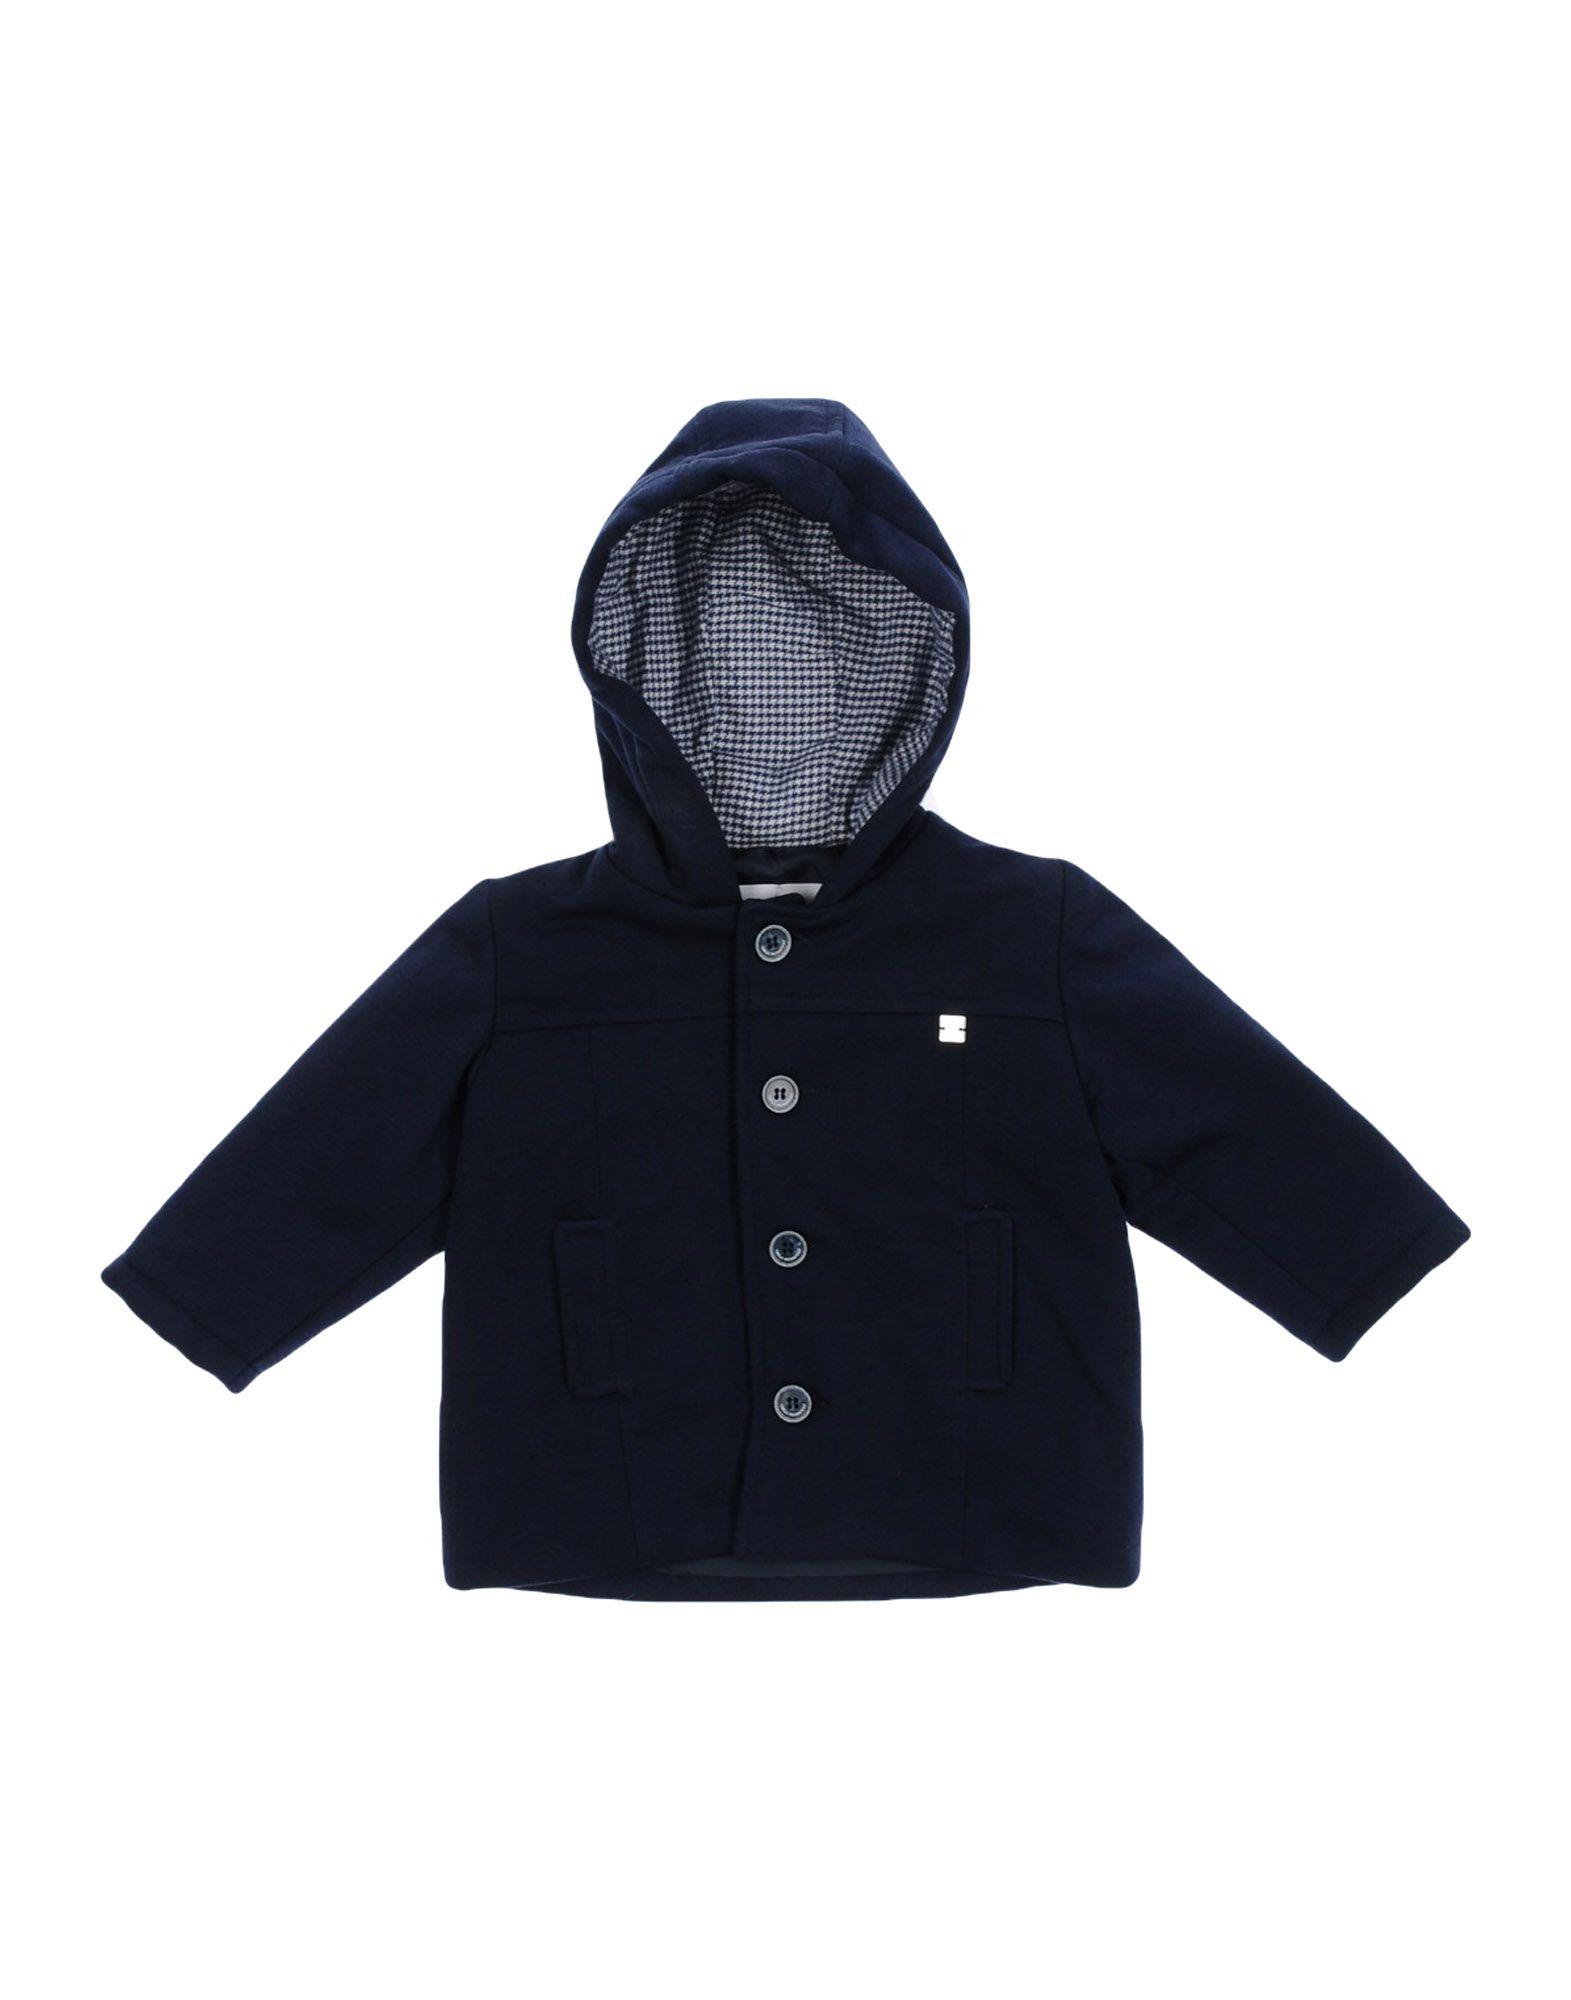 CARLO PIGNATELLI Jacket in Dark Blue